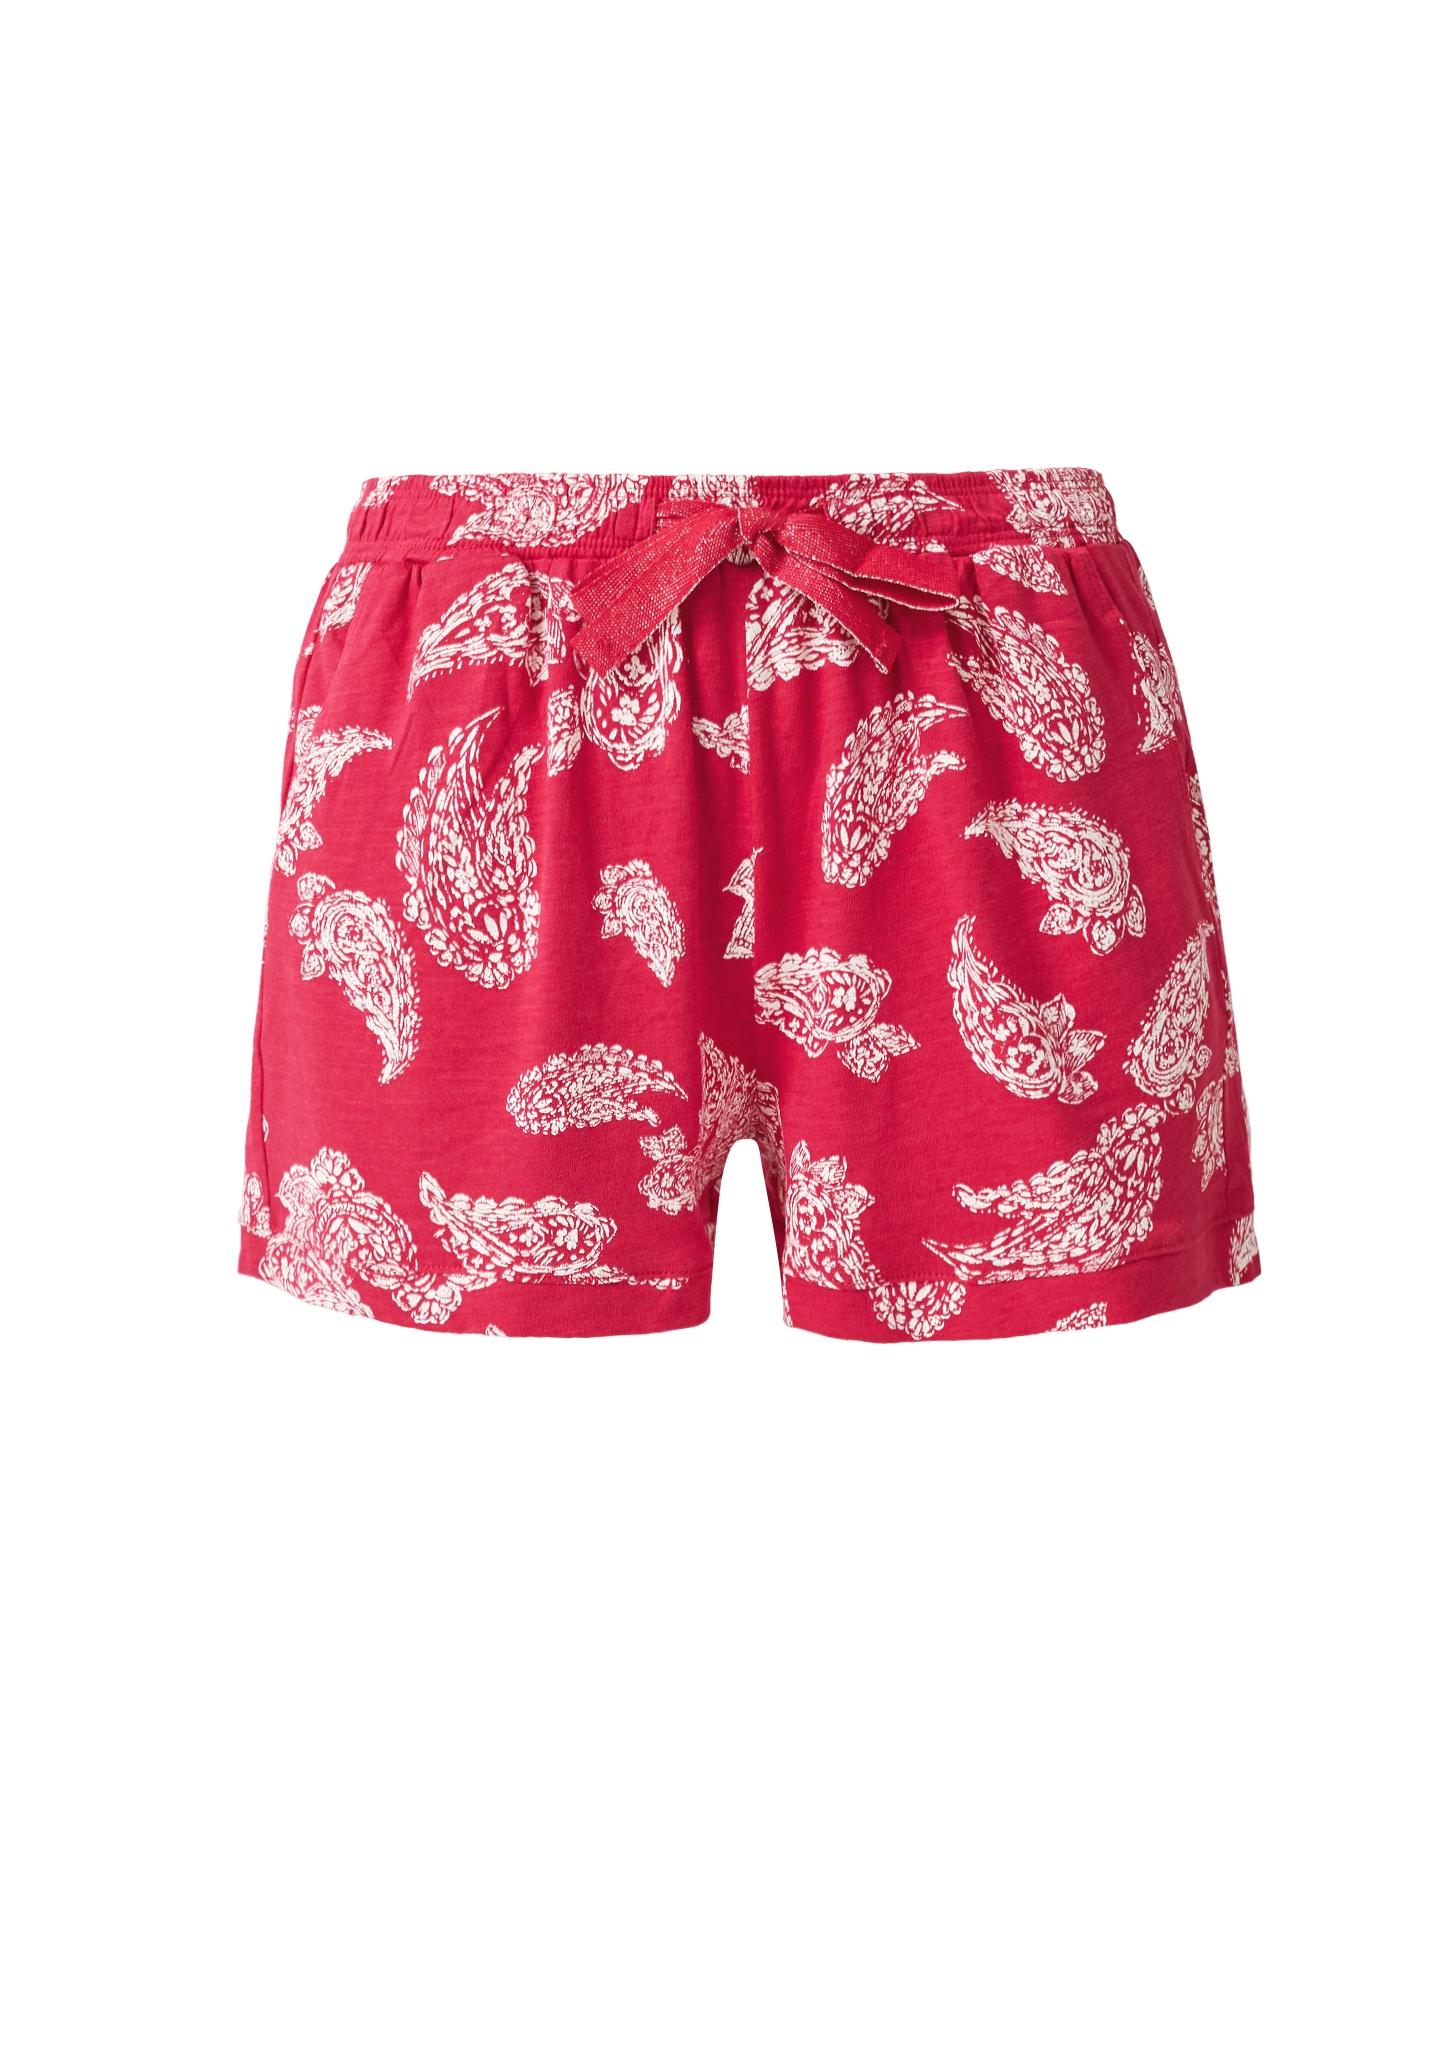 s-Oliver-Casual-Women-Jerseyshorts-mit-Musterprint-Neu Indexbild 20